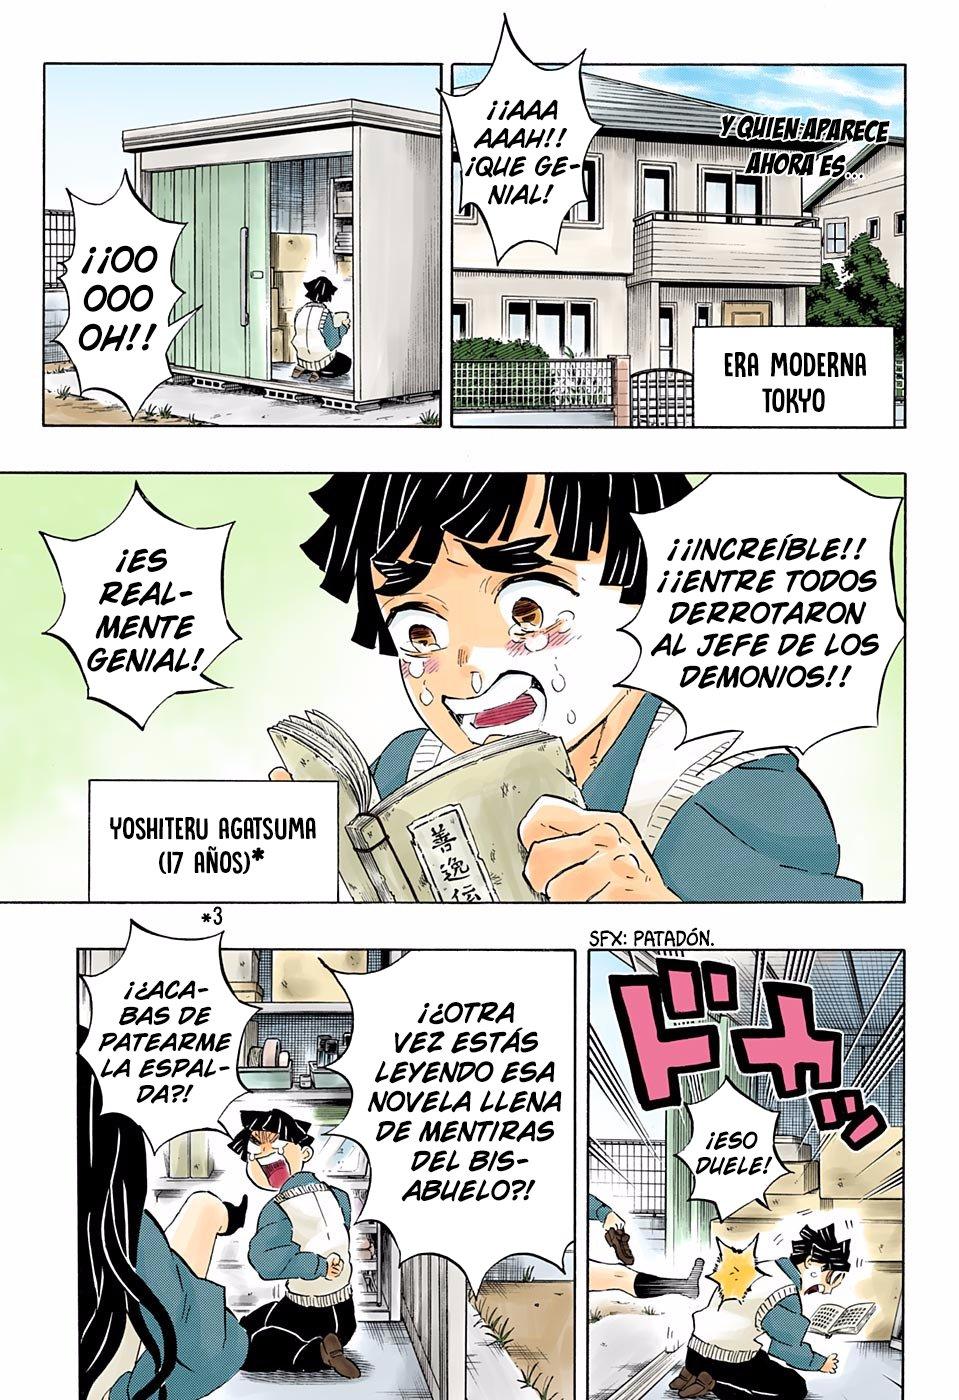 https://nine.mangadogs.com/es_manga/pic8/3/19331/946720/177fdb0c18f85f1fa5dcfc76d9b2cdd9.jpg Page 5